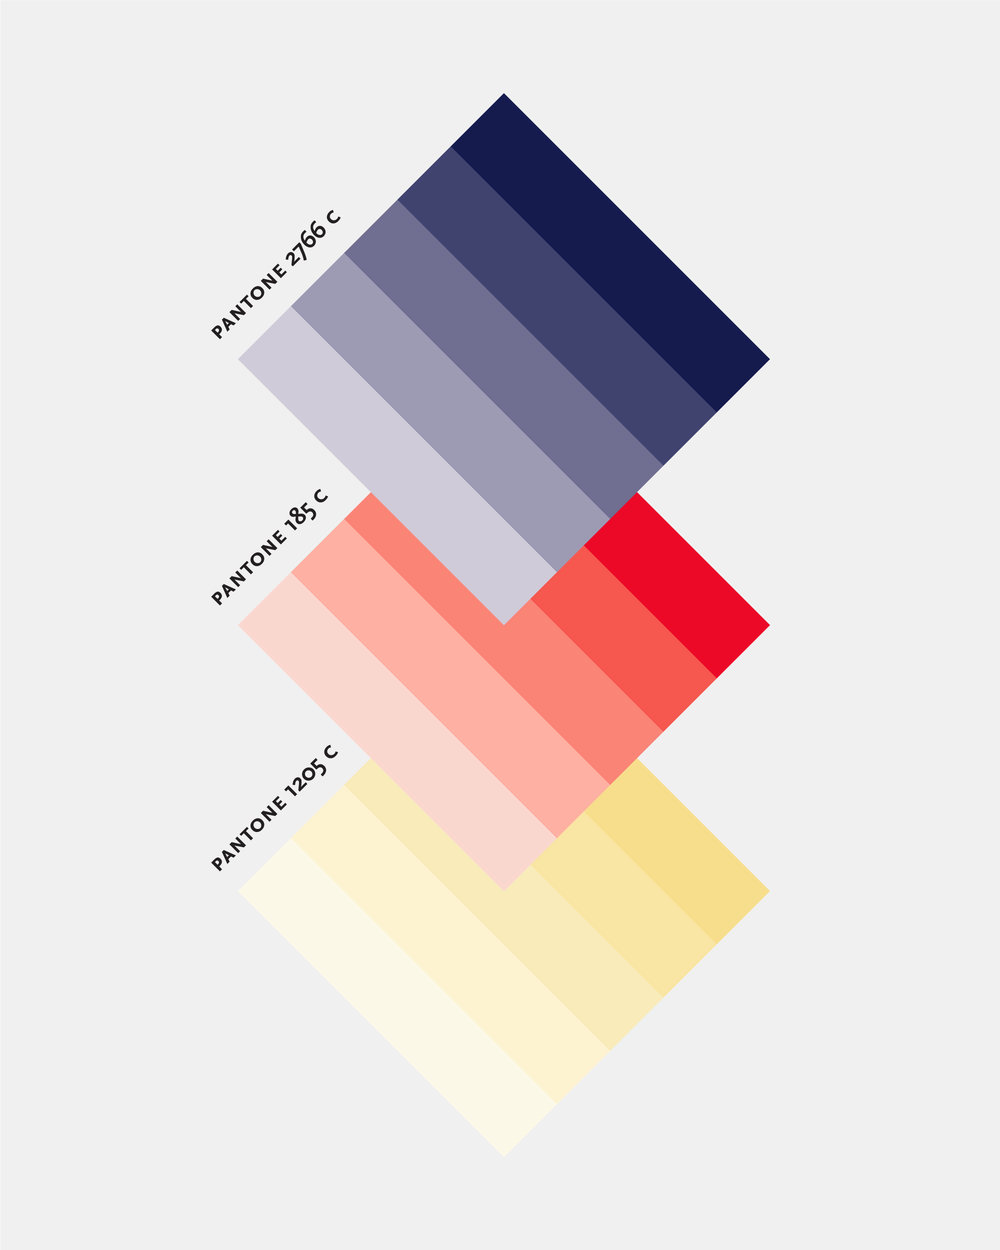 StAndrews_Colors